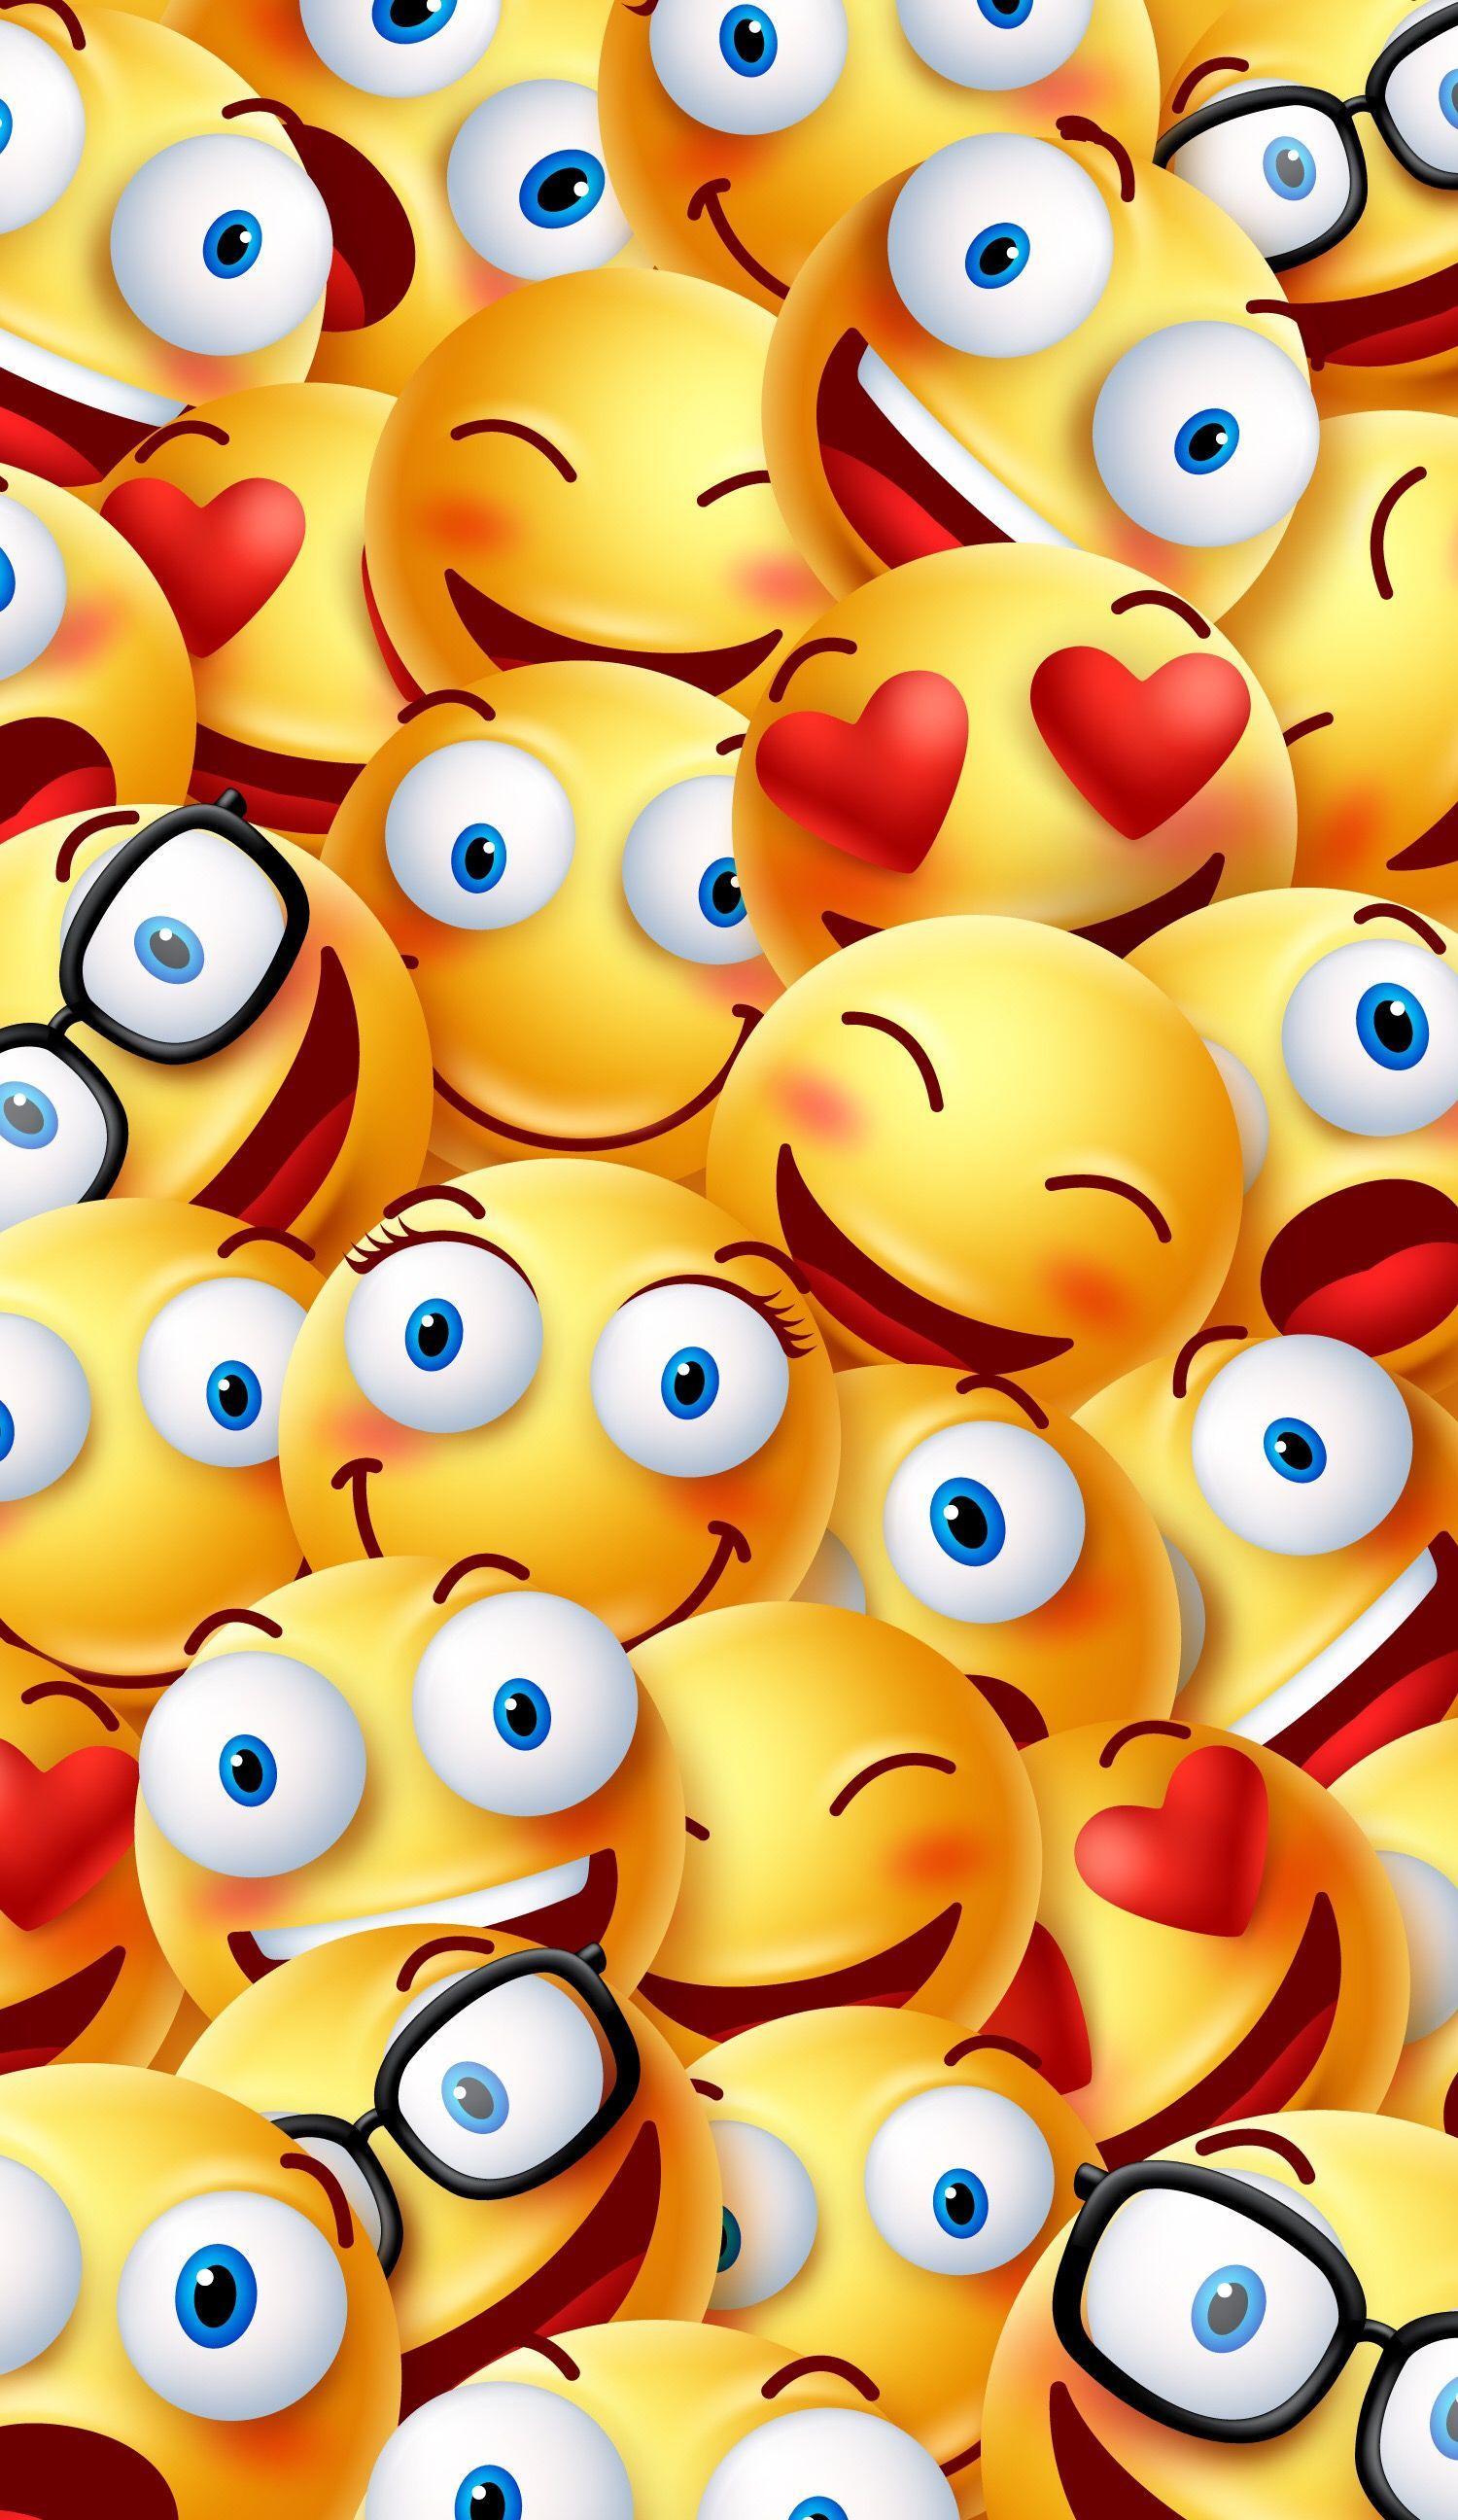 Funny Emoji Wallpapers - Wallpaper Cave